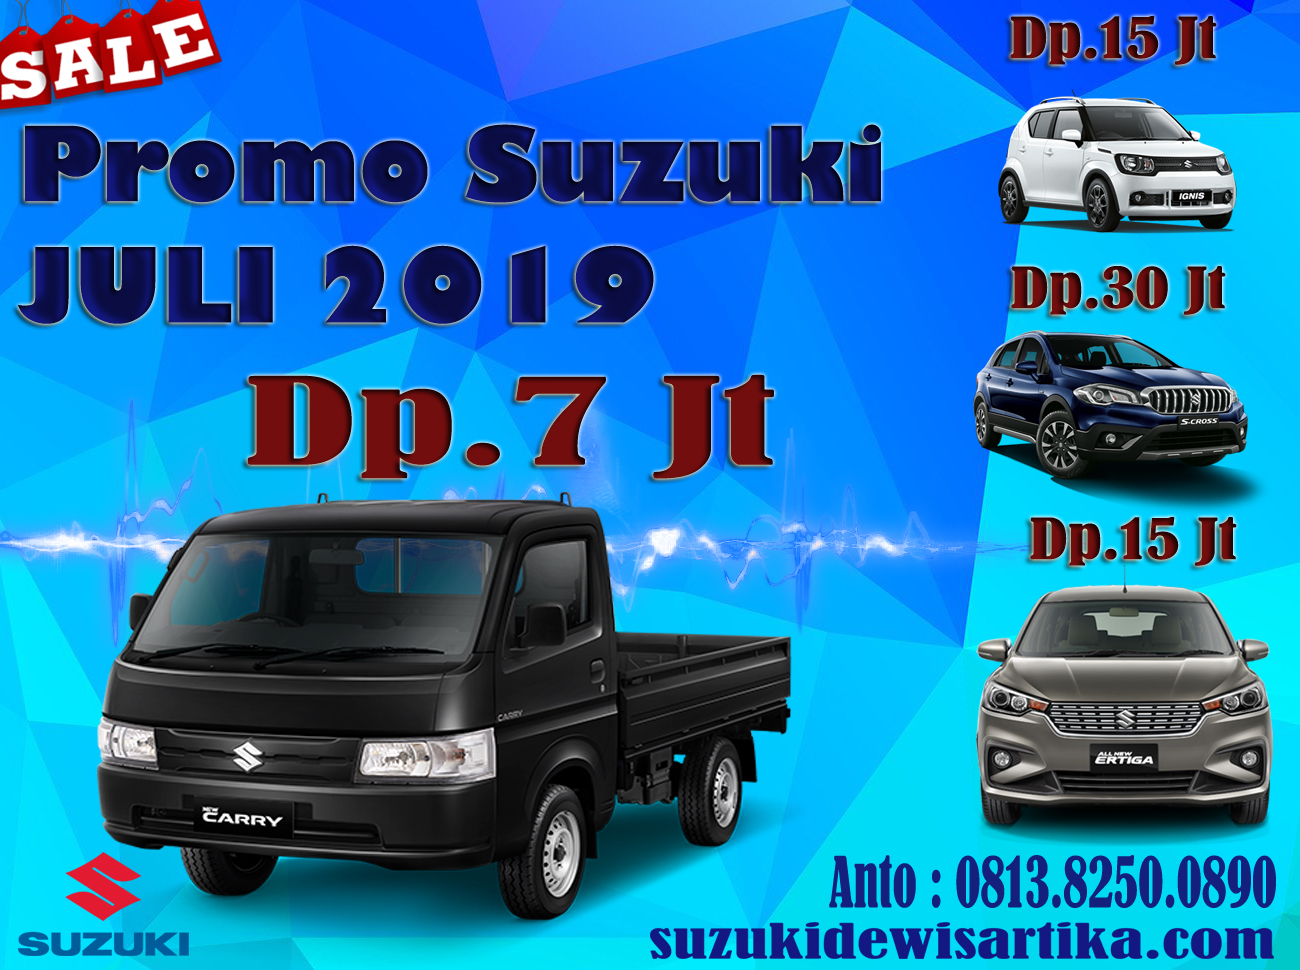 Harga Suzuki Ertiga Dp 5 Jt Suzuki Ignis Kredit Promo